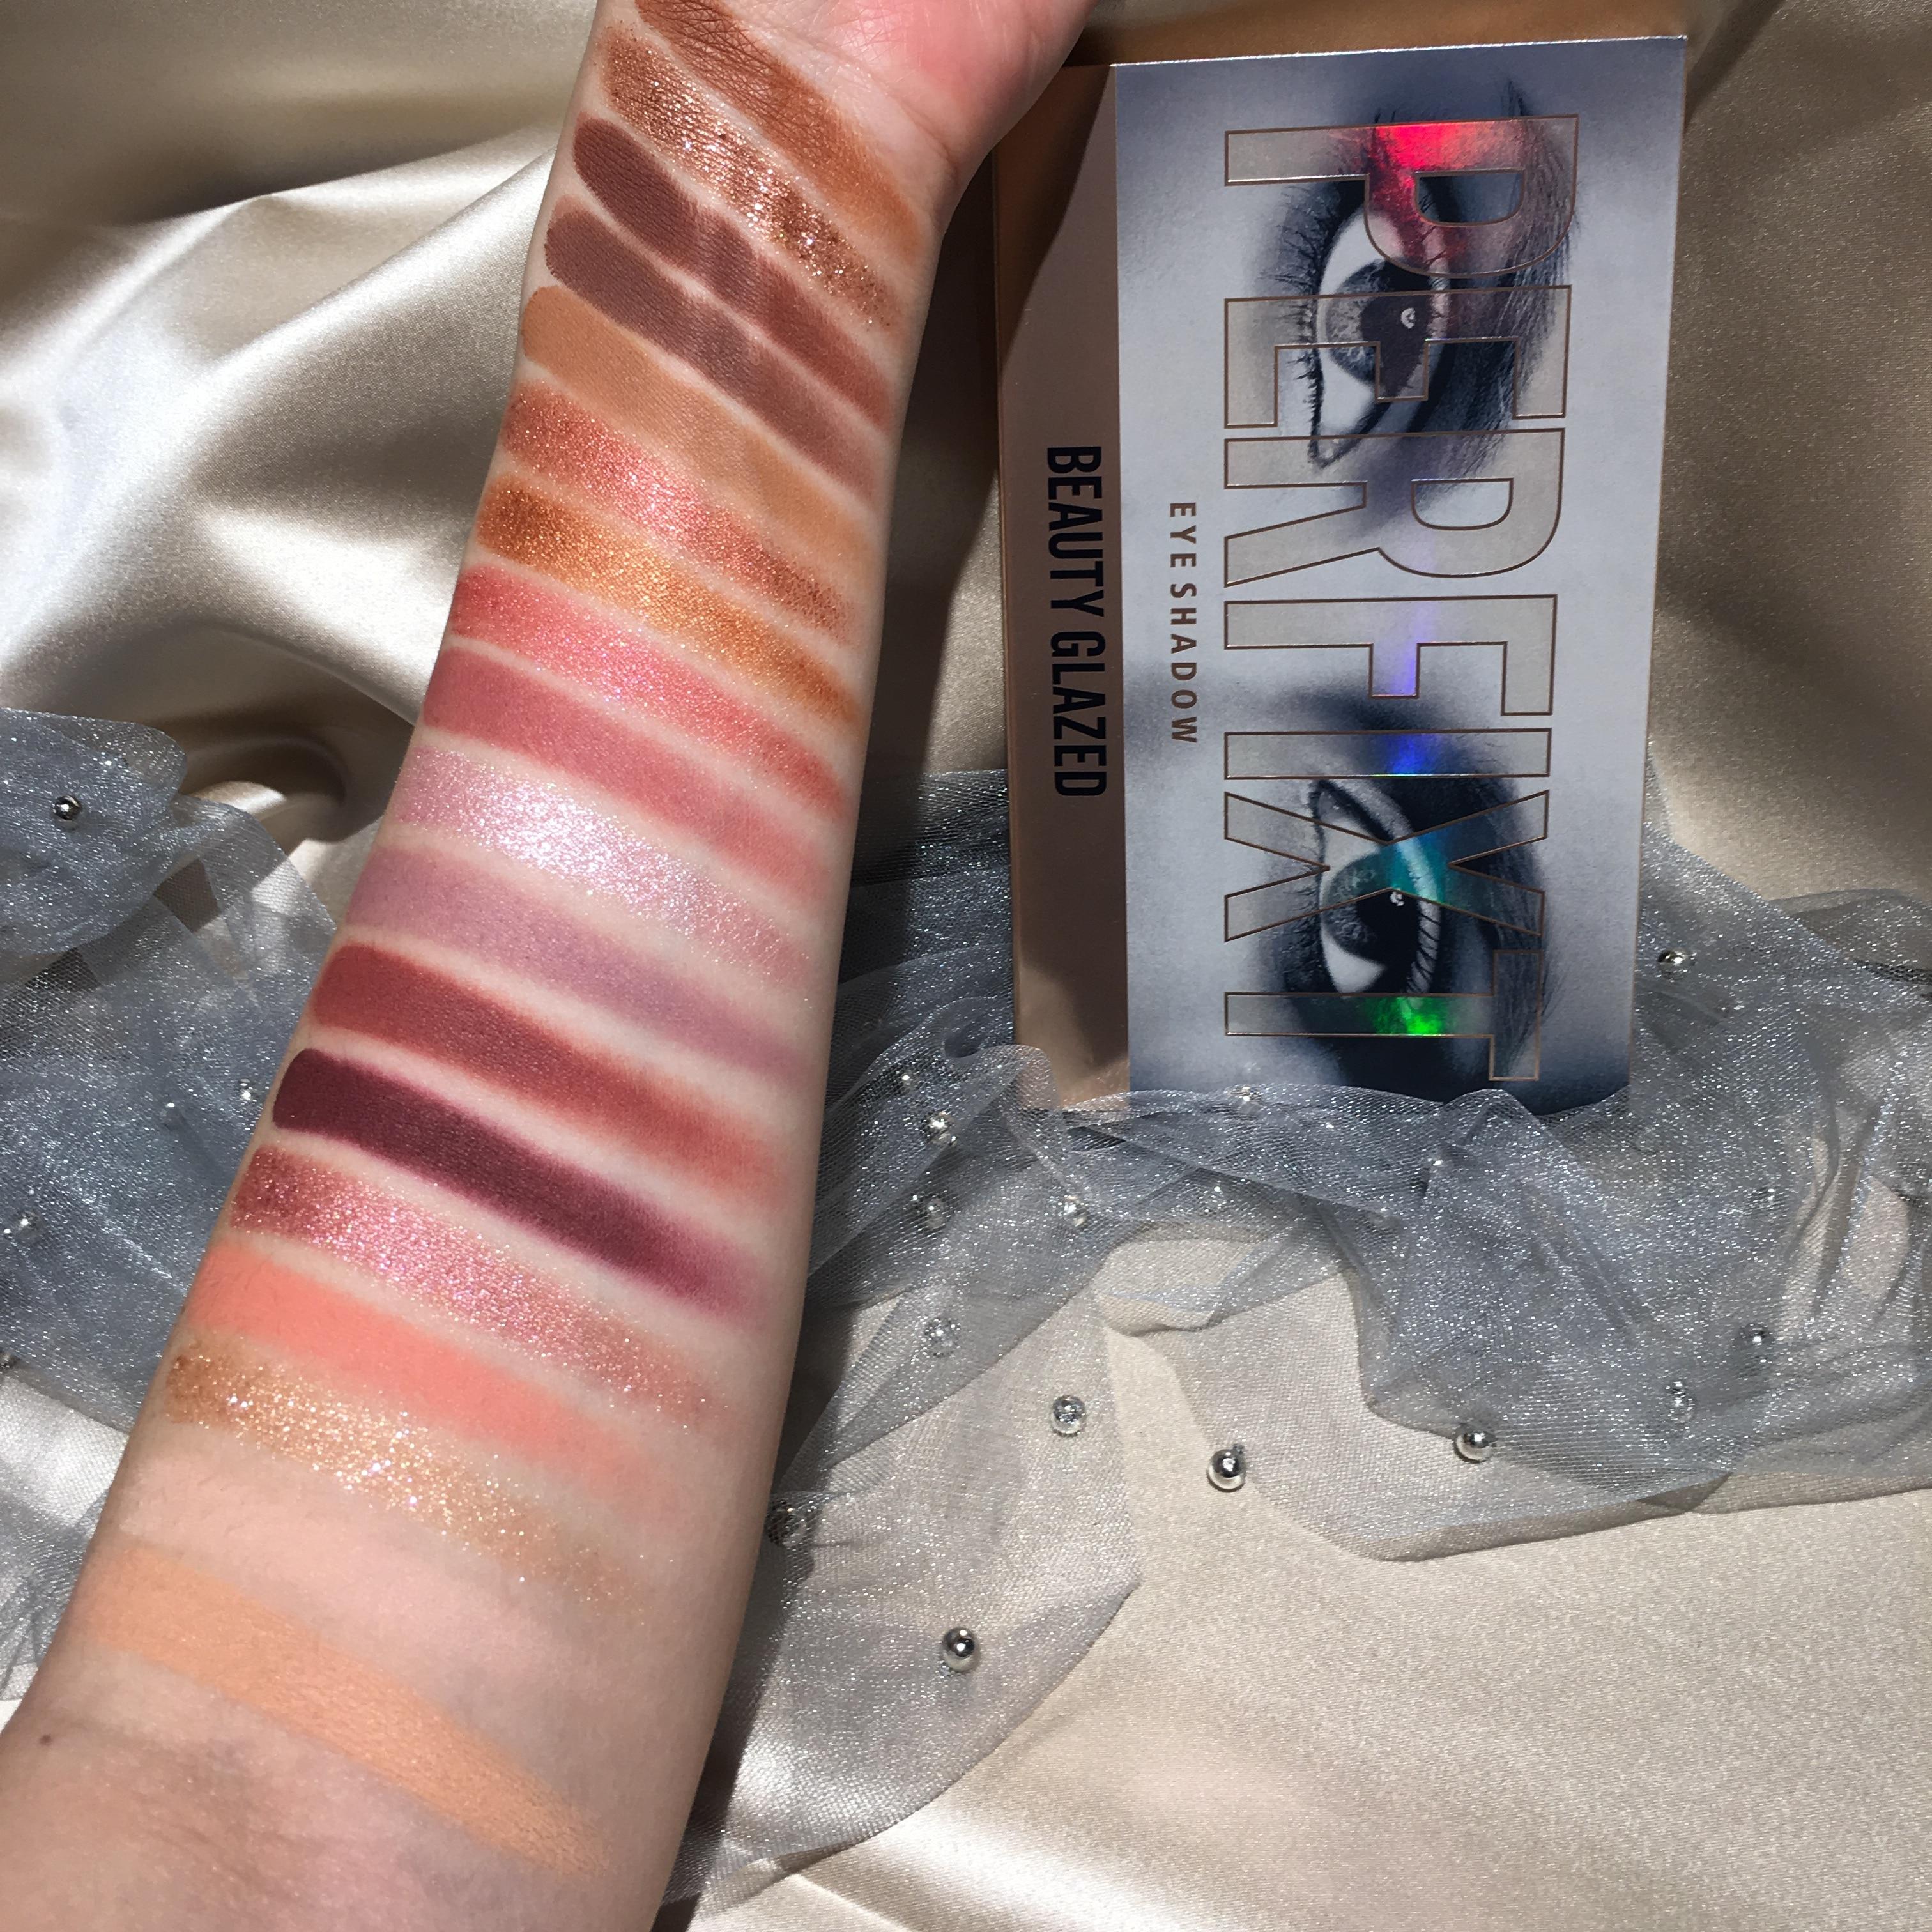 BEAUTY GLAZED Makeup paleta de sombras de ojos de 18 colores Color Nude paleta de sombras de ojos a prueba de agua paleta de sombras de ojos brochas de maquillaje paleta de sombras de ojos cosméticos